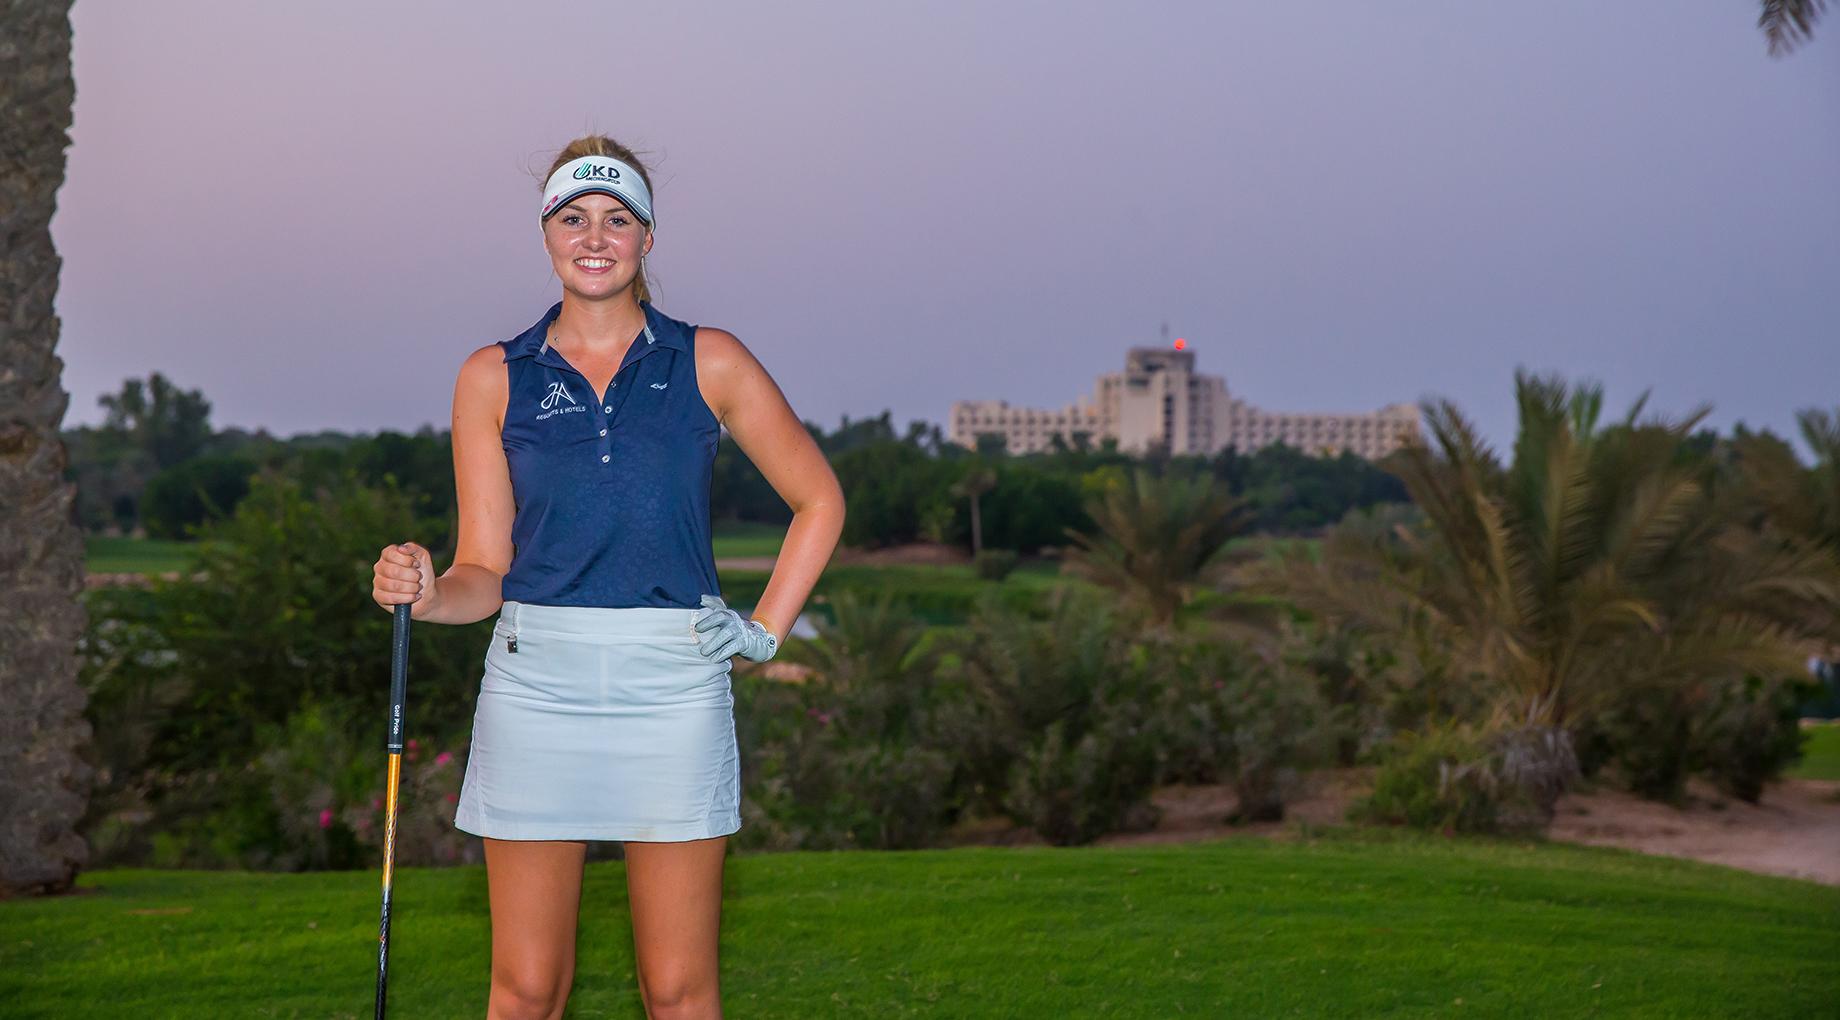 JA Resorts & Hotels sponsors young golfer Olivia Cowan